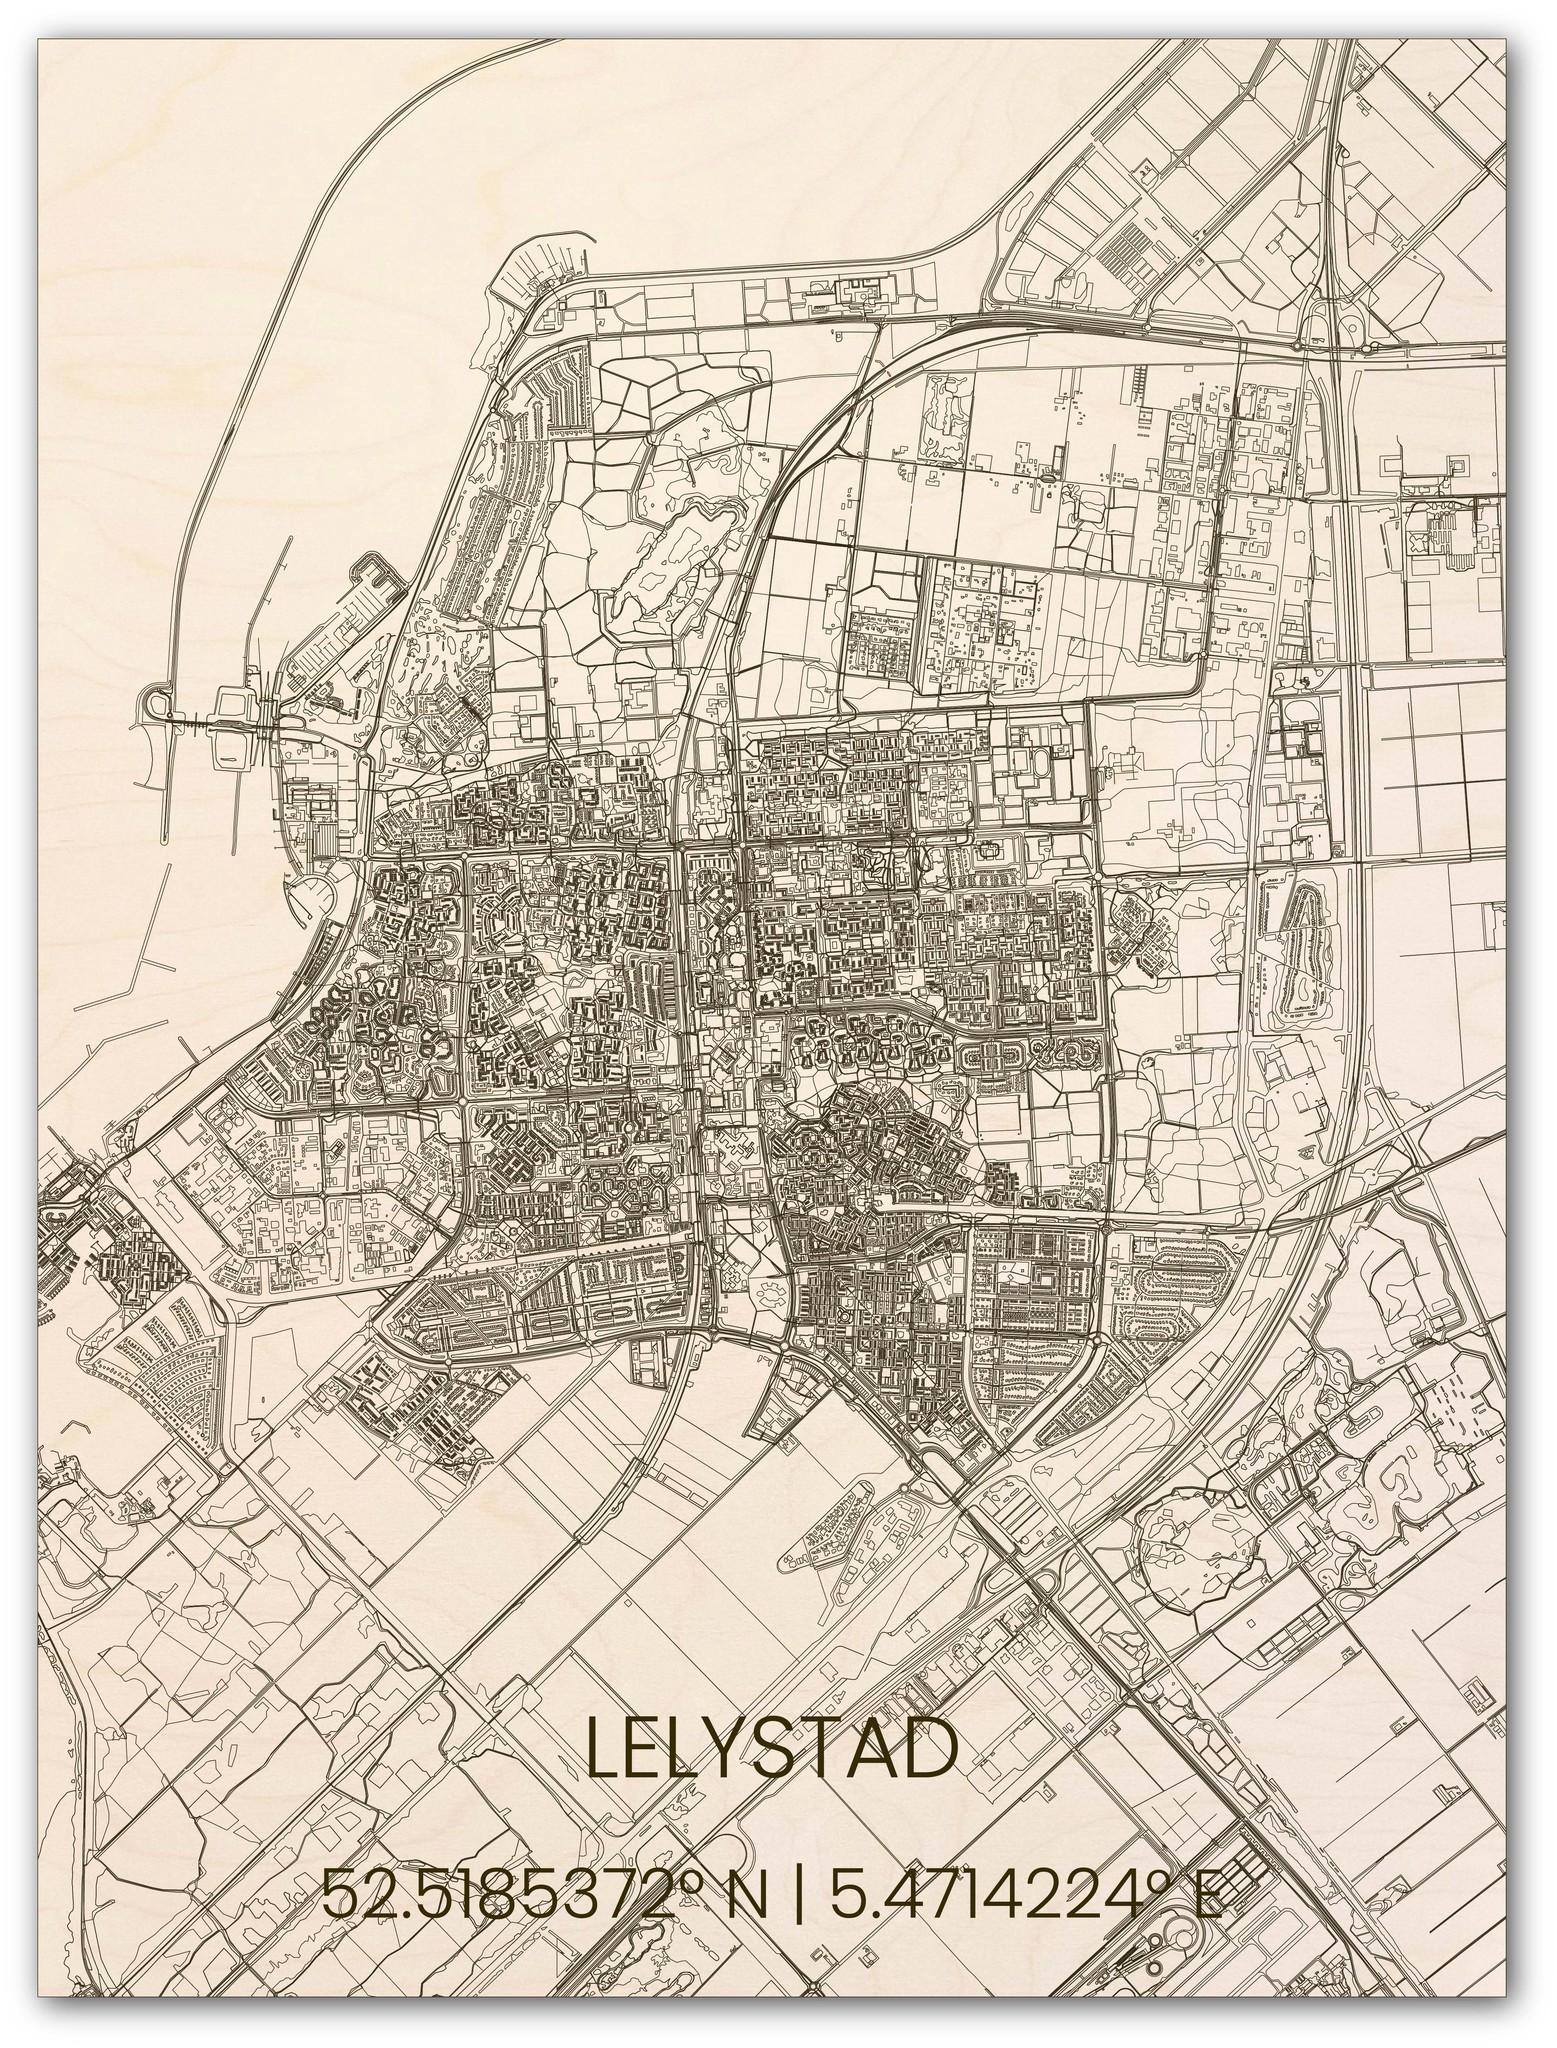 Houten stadsplattegrond Lelystad-1